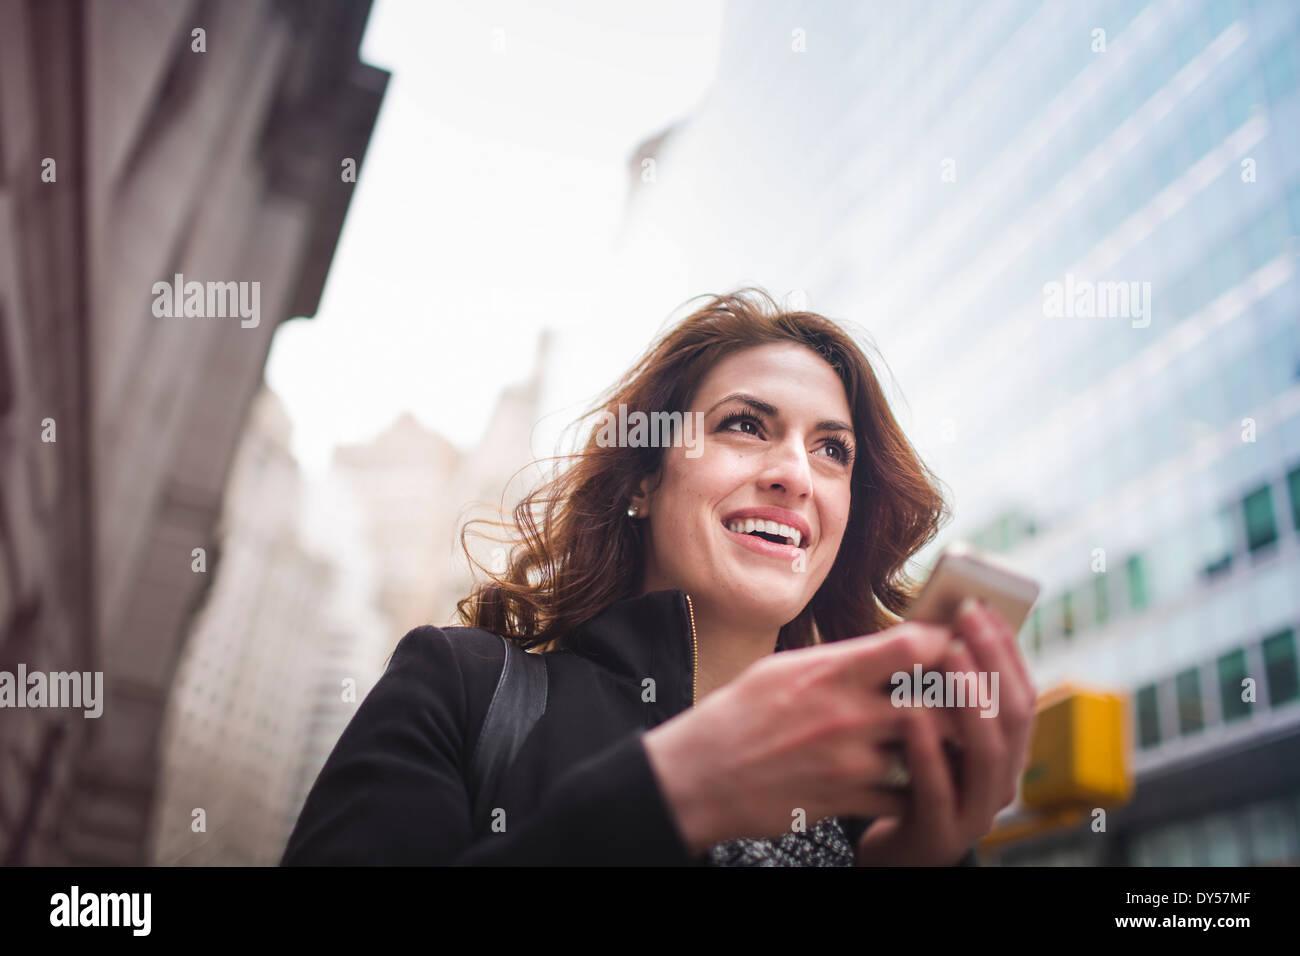 Mujer joven holding móvil, Nueva York, EE.UU. Imagen De Stock